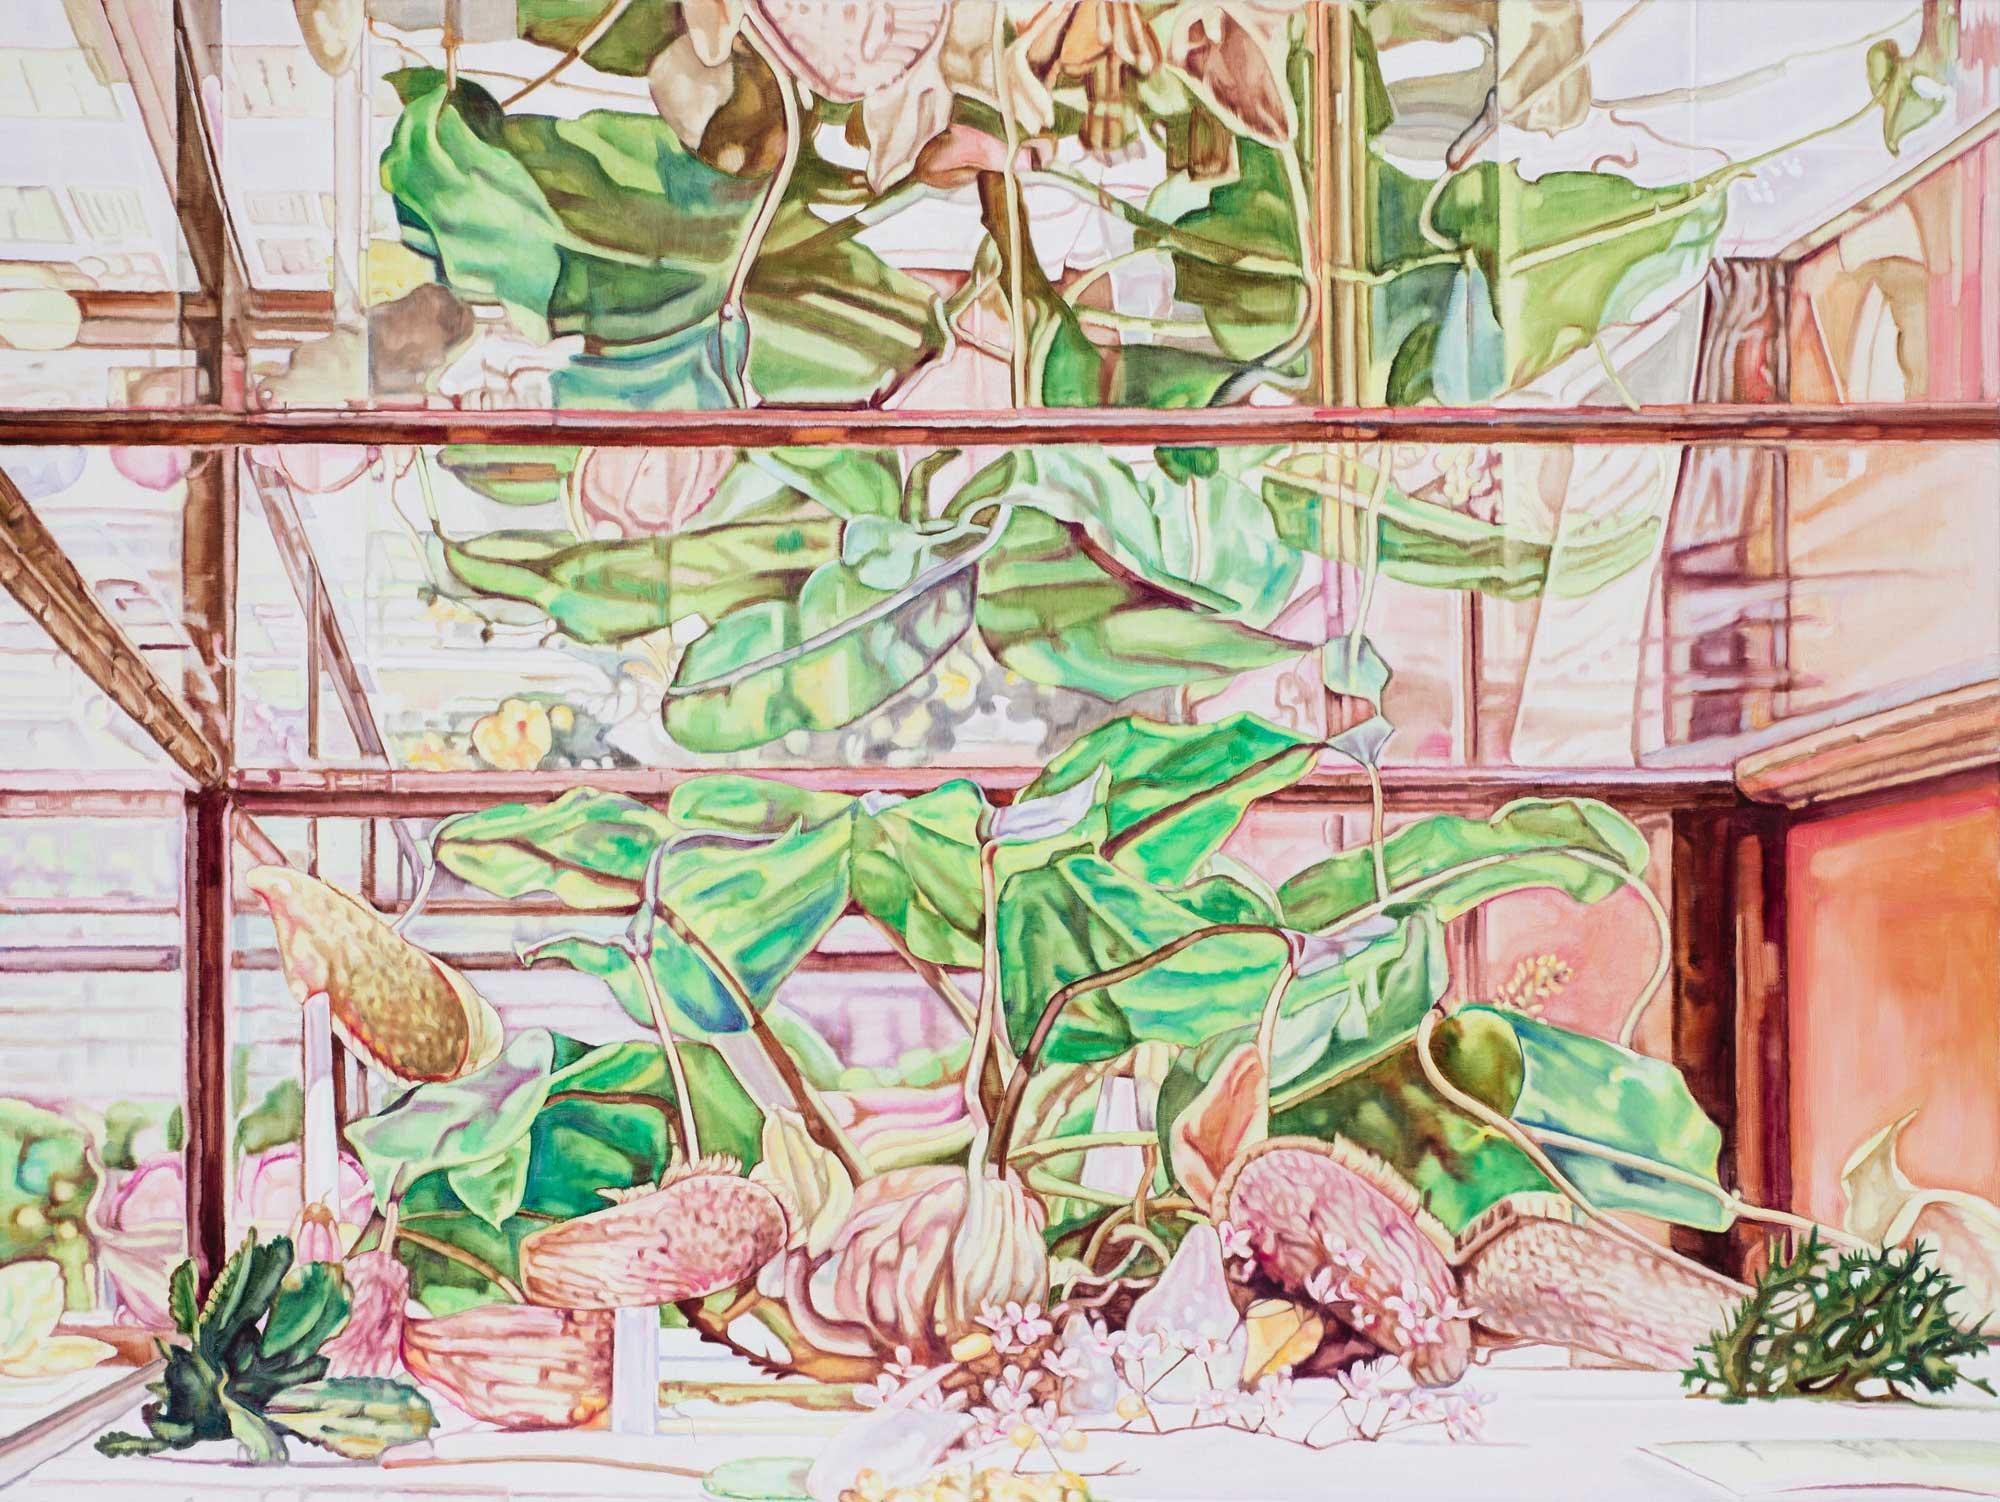 Big Jungle , 2014 122 x 163cm oil on linen